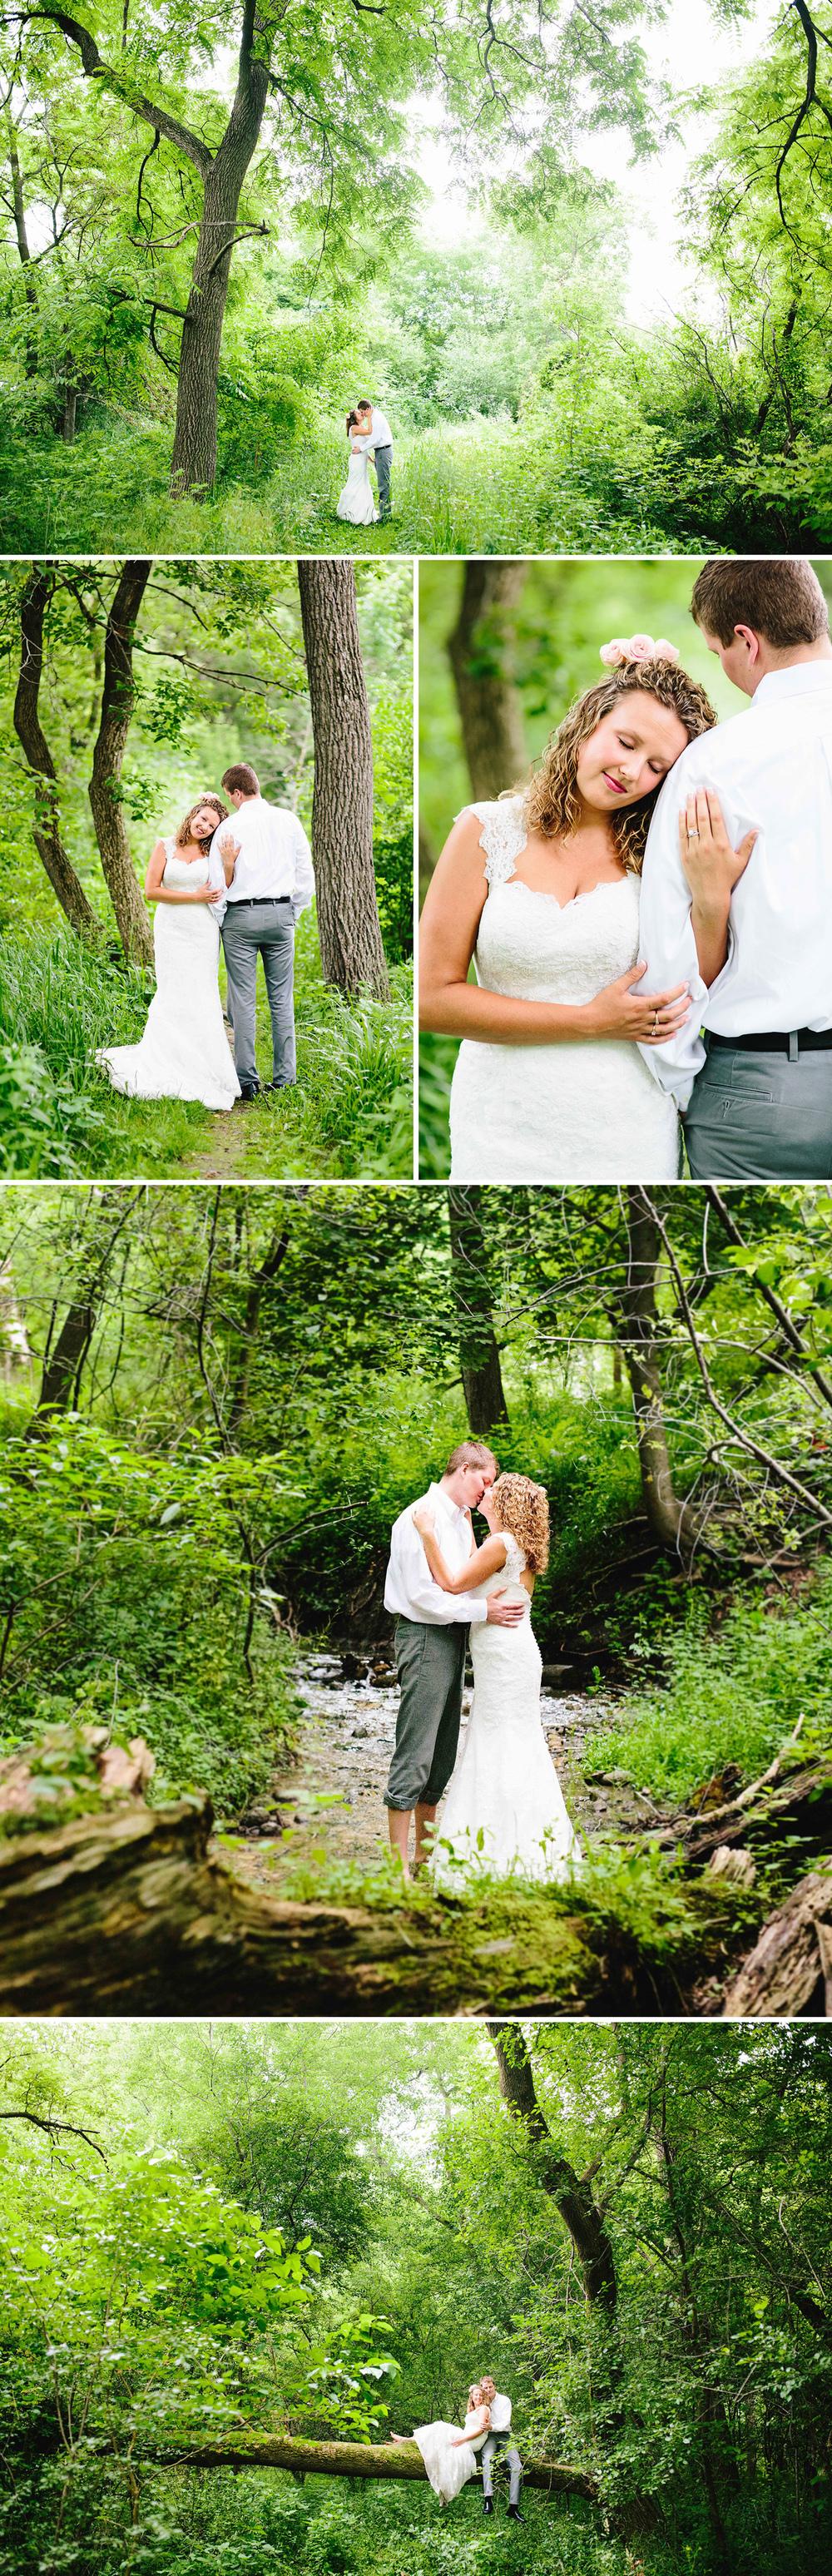 chicago-fine-art-wedding-photography-mcginn1